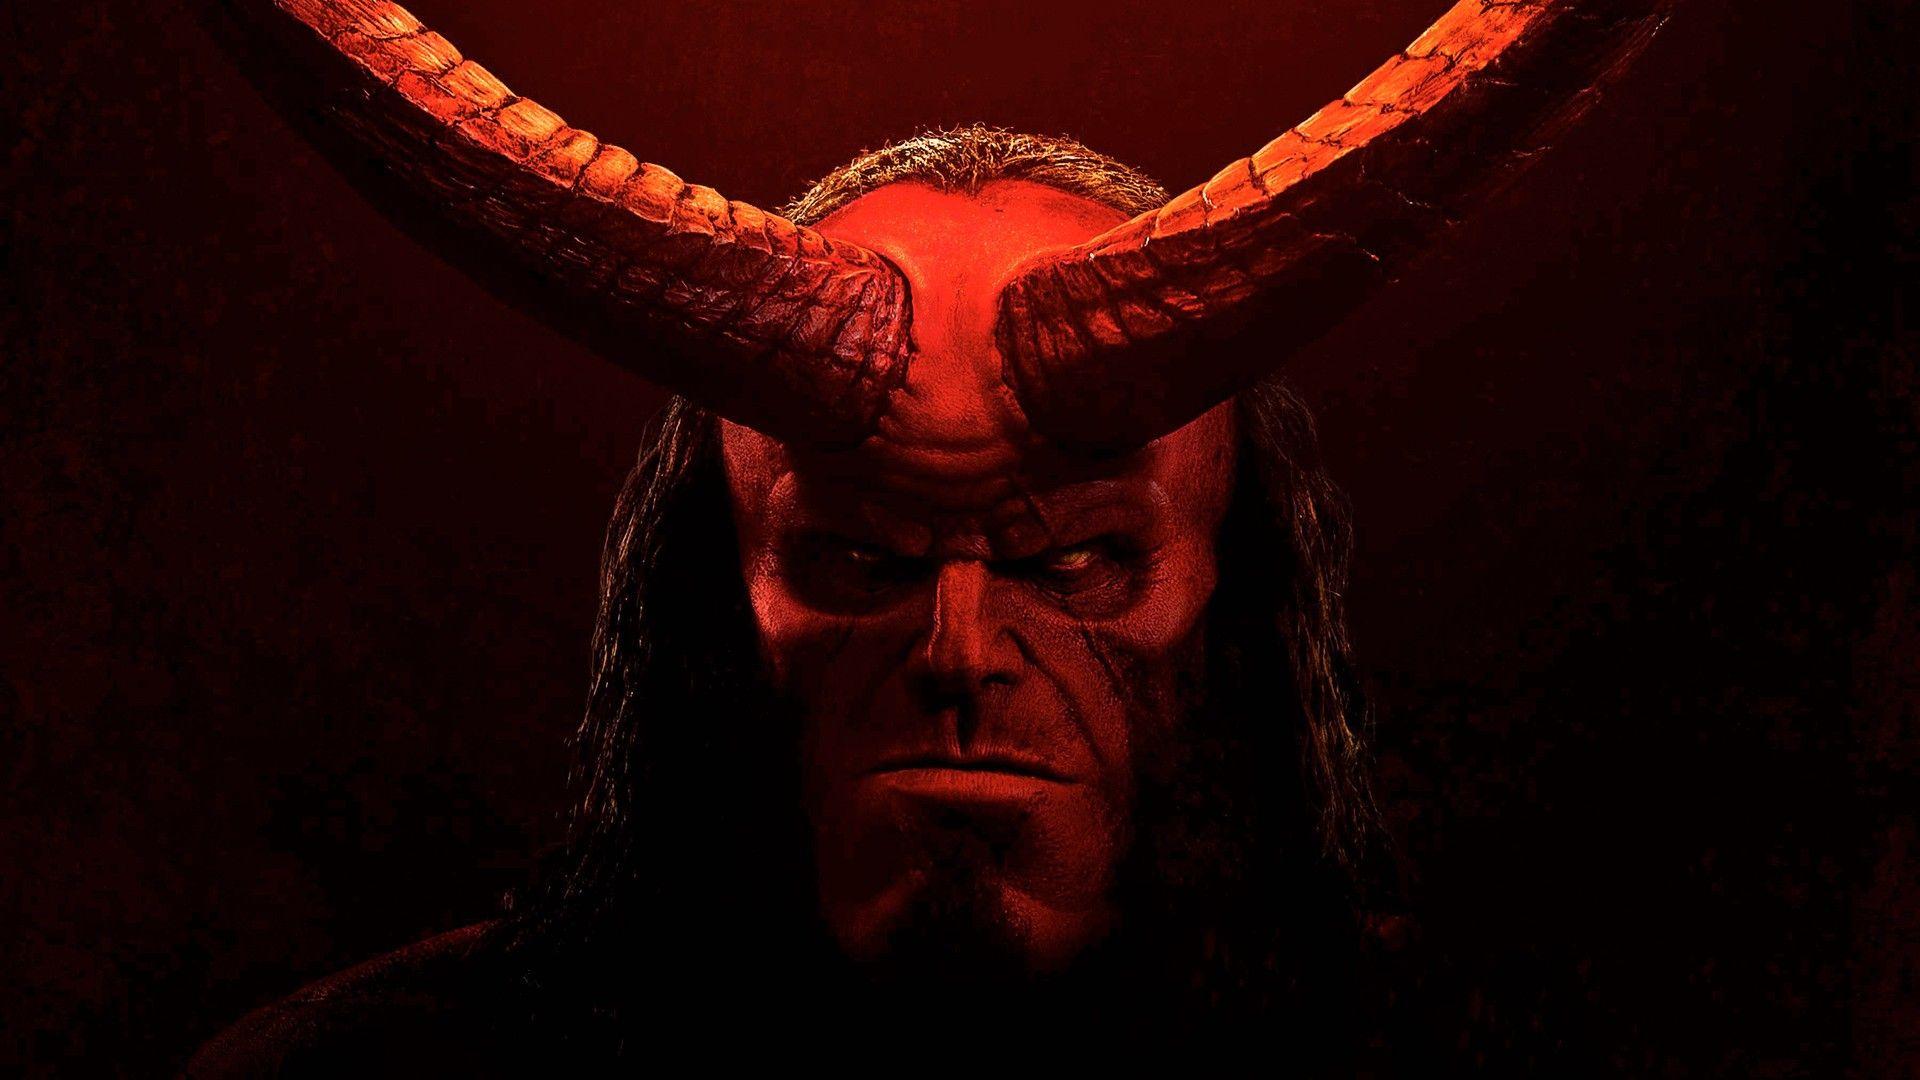 Wallpapers Hellboy Best Movie Poster Wallpaper Hd